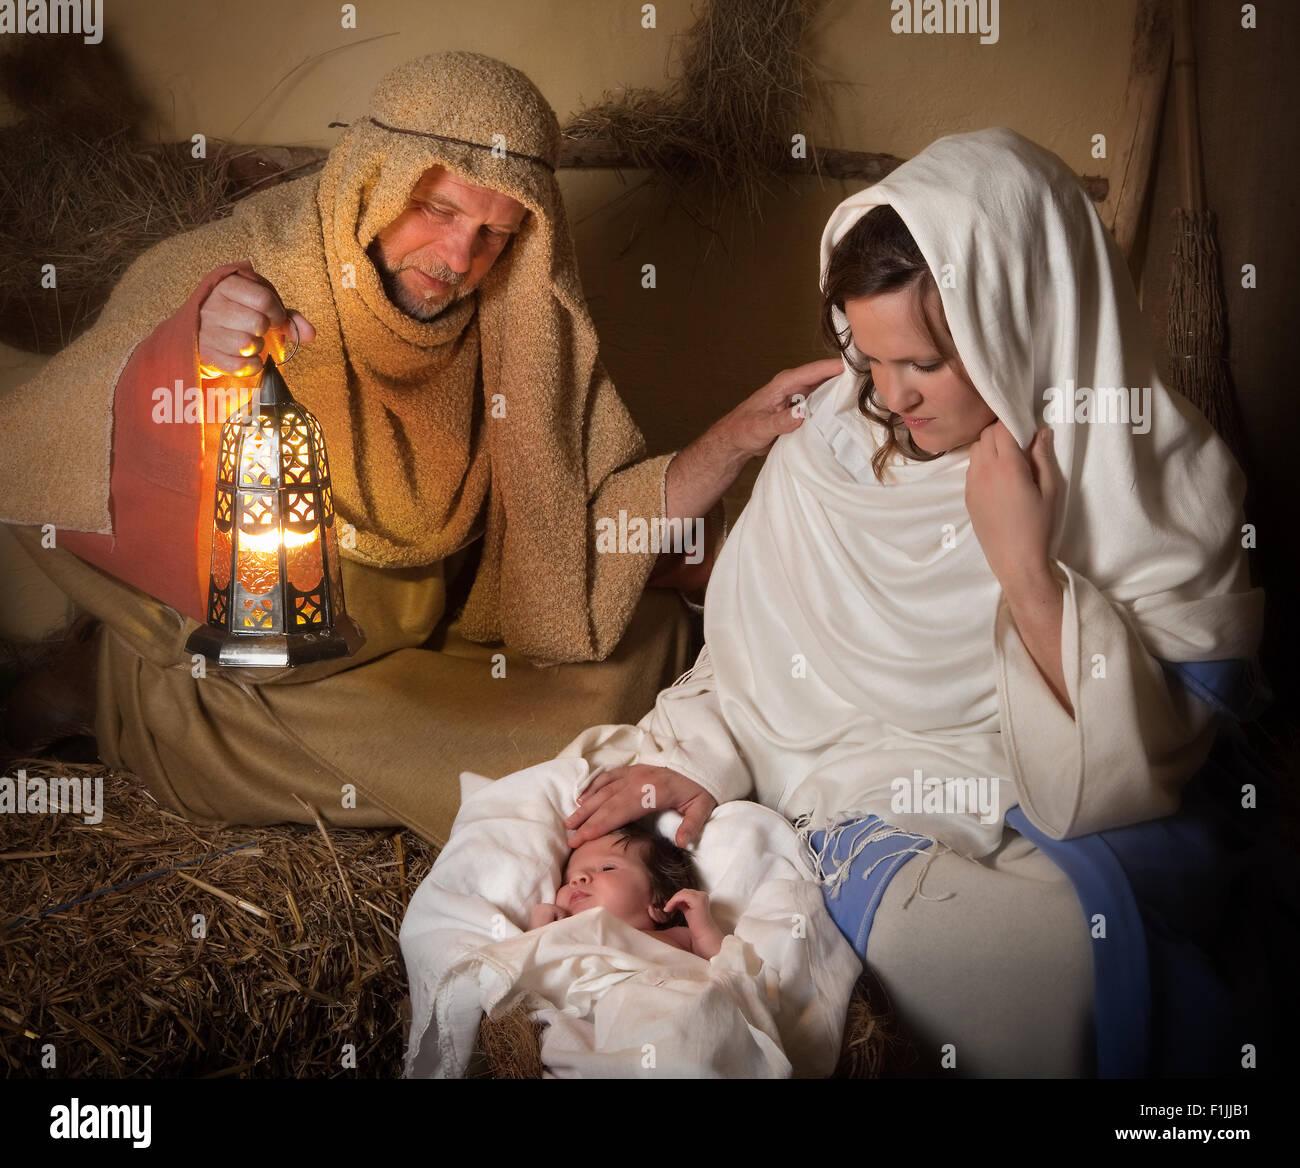 Live reenactment of the christmas nativity scene Stock Photo